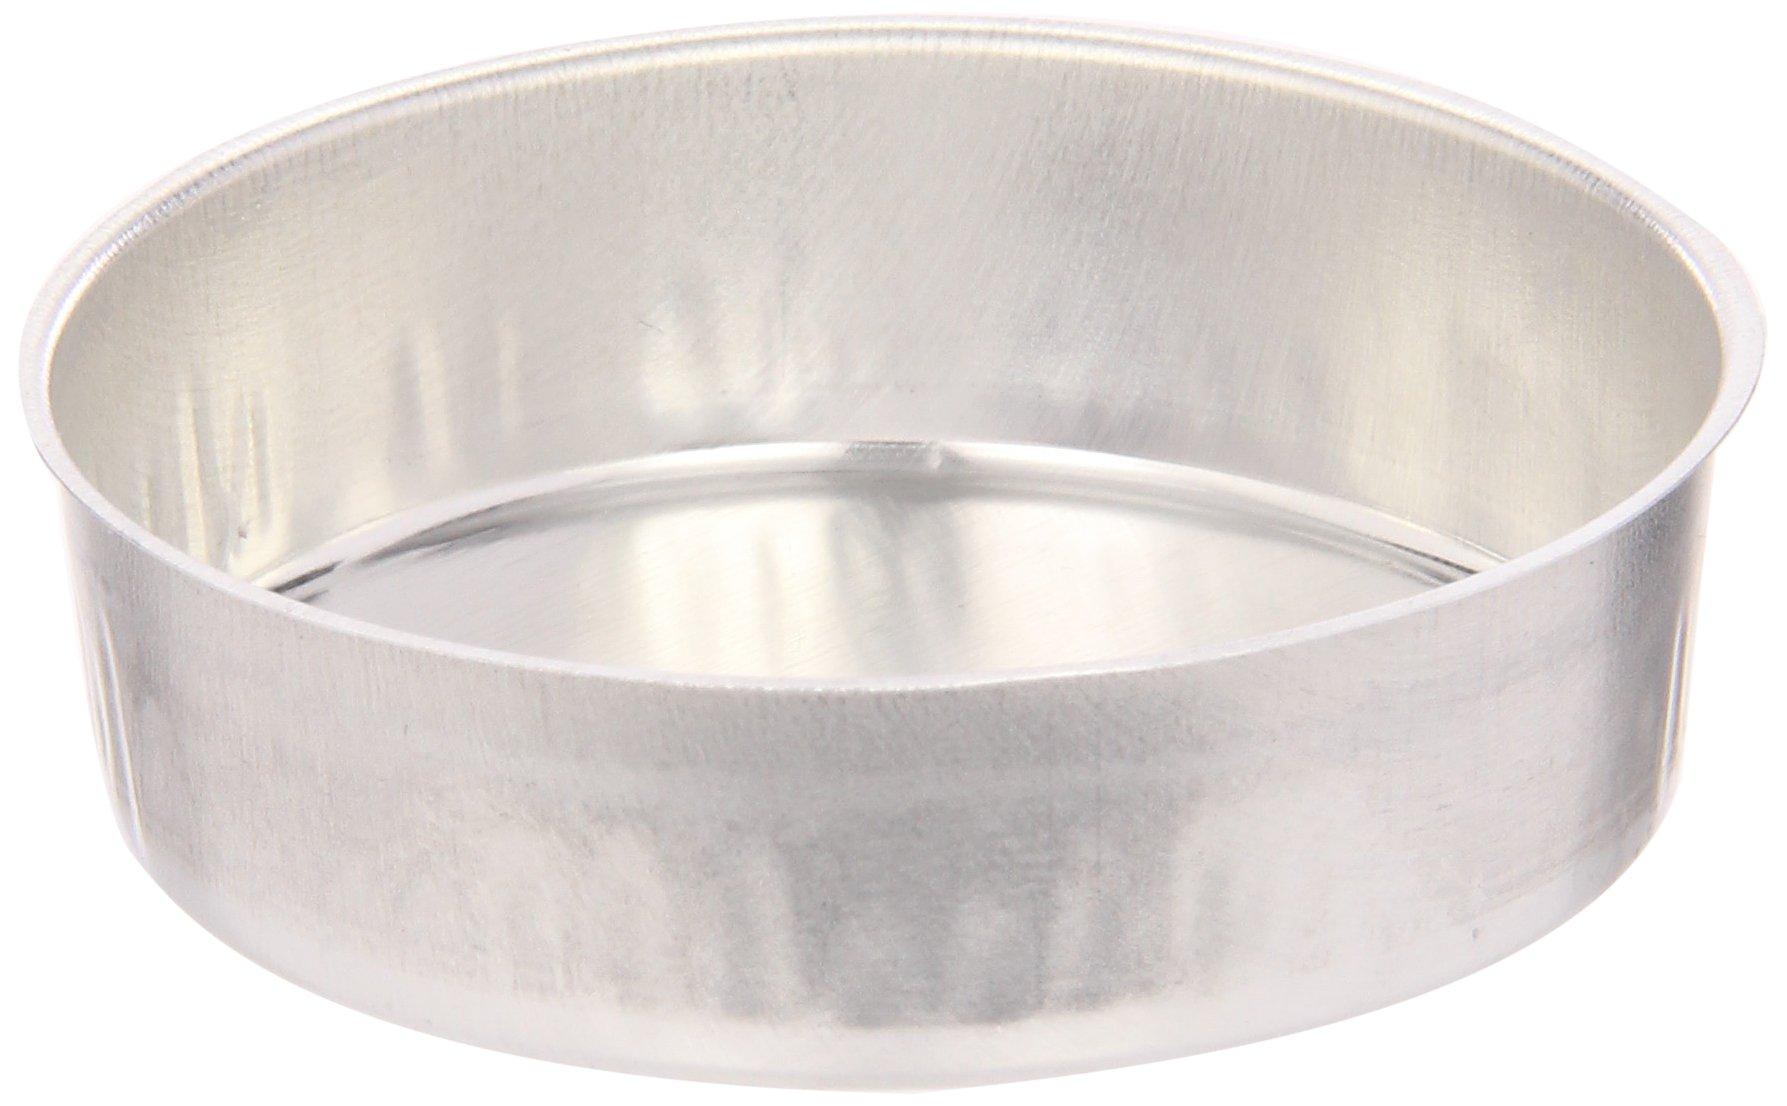 Thomas Smooth Aluminum Weigh Dish, 57mm Dia x 16mm Depth, 50mL Capacity (Case of 1000)